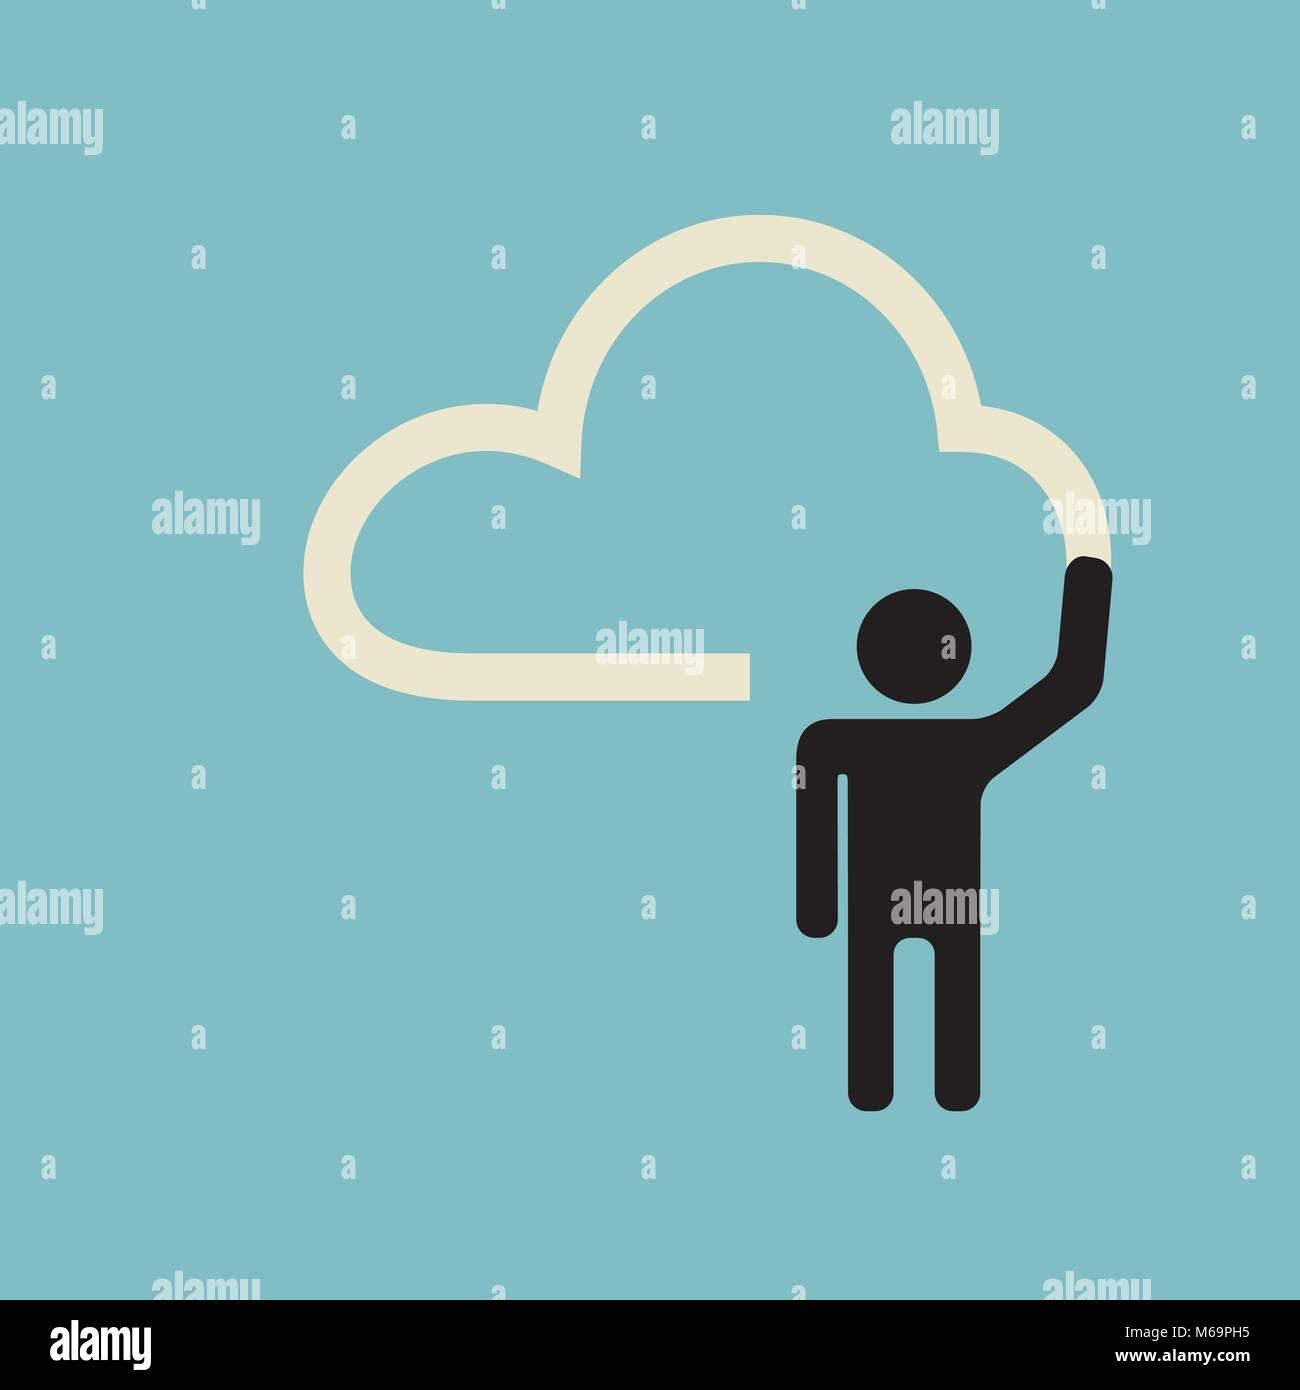 cloud design - presenting creative idea plan - Stock Vector